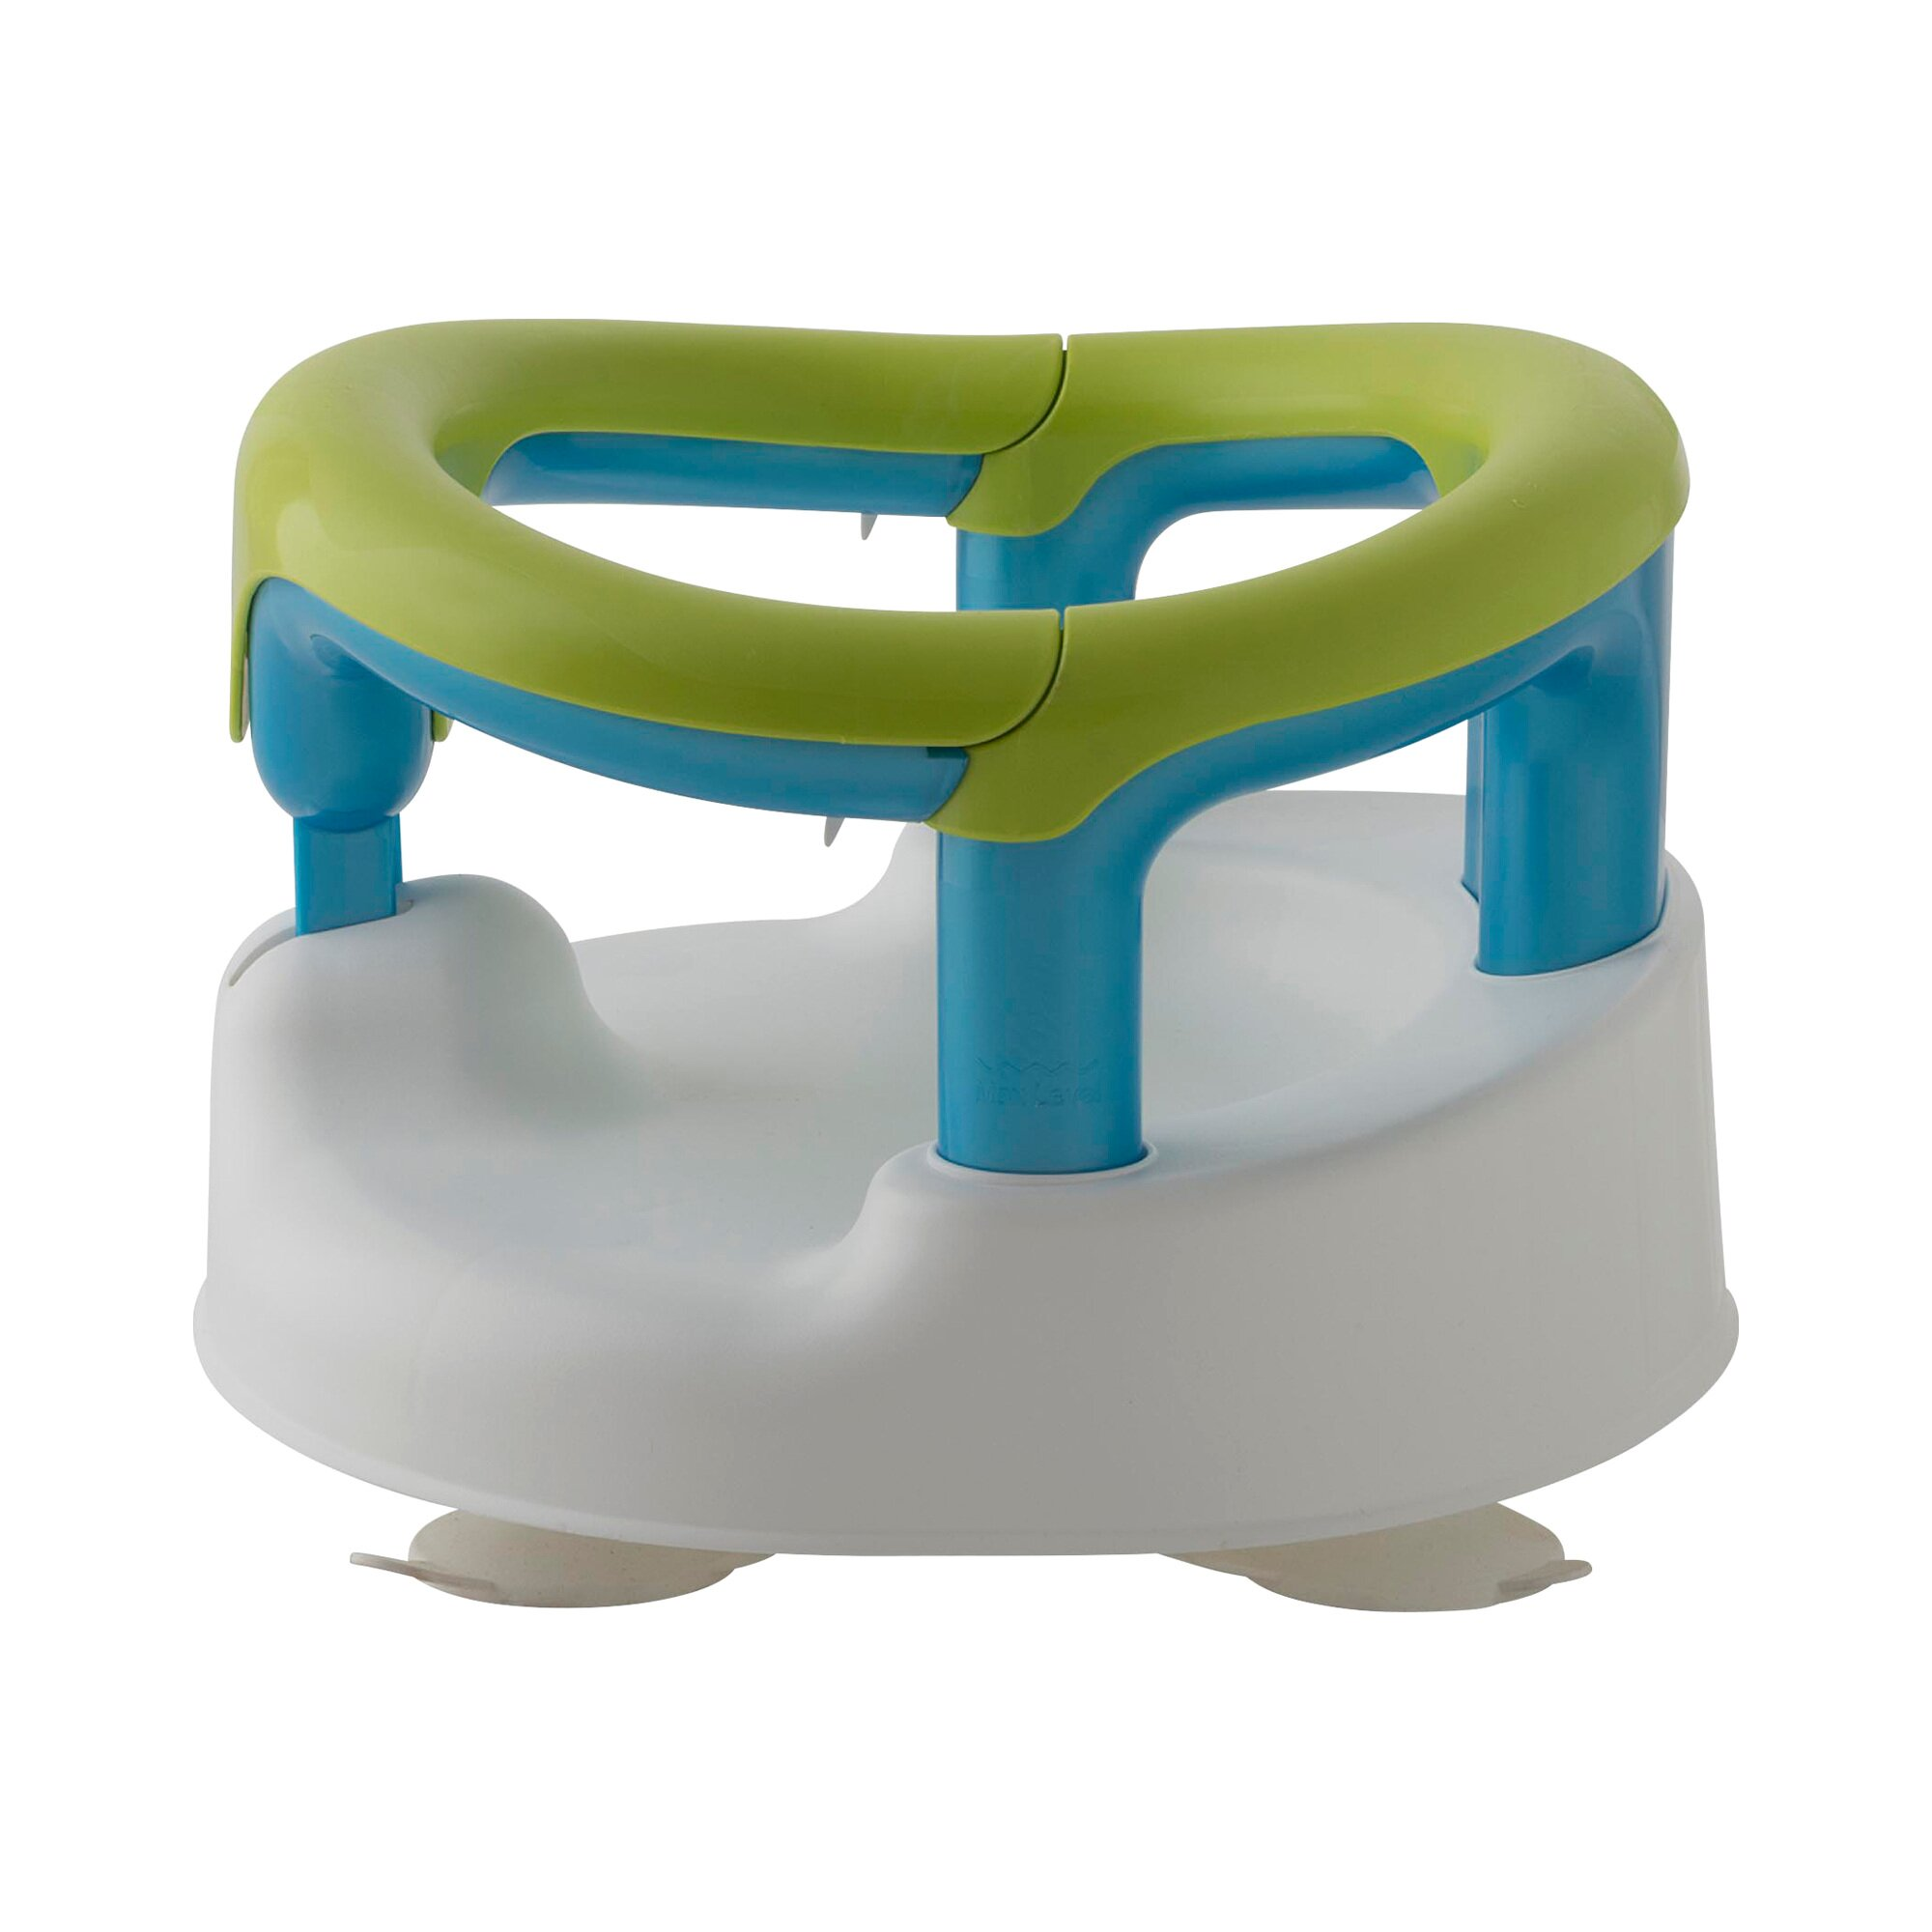 Rotho Babydesign Badesitz Preisvergleich